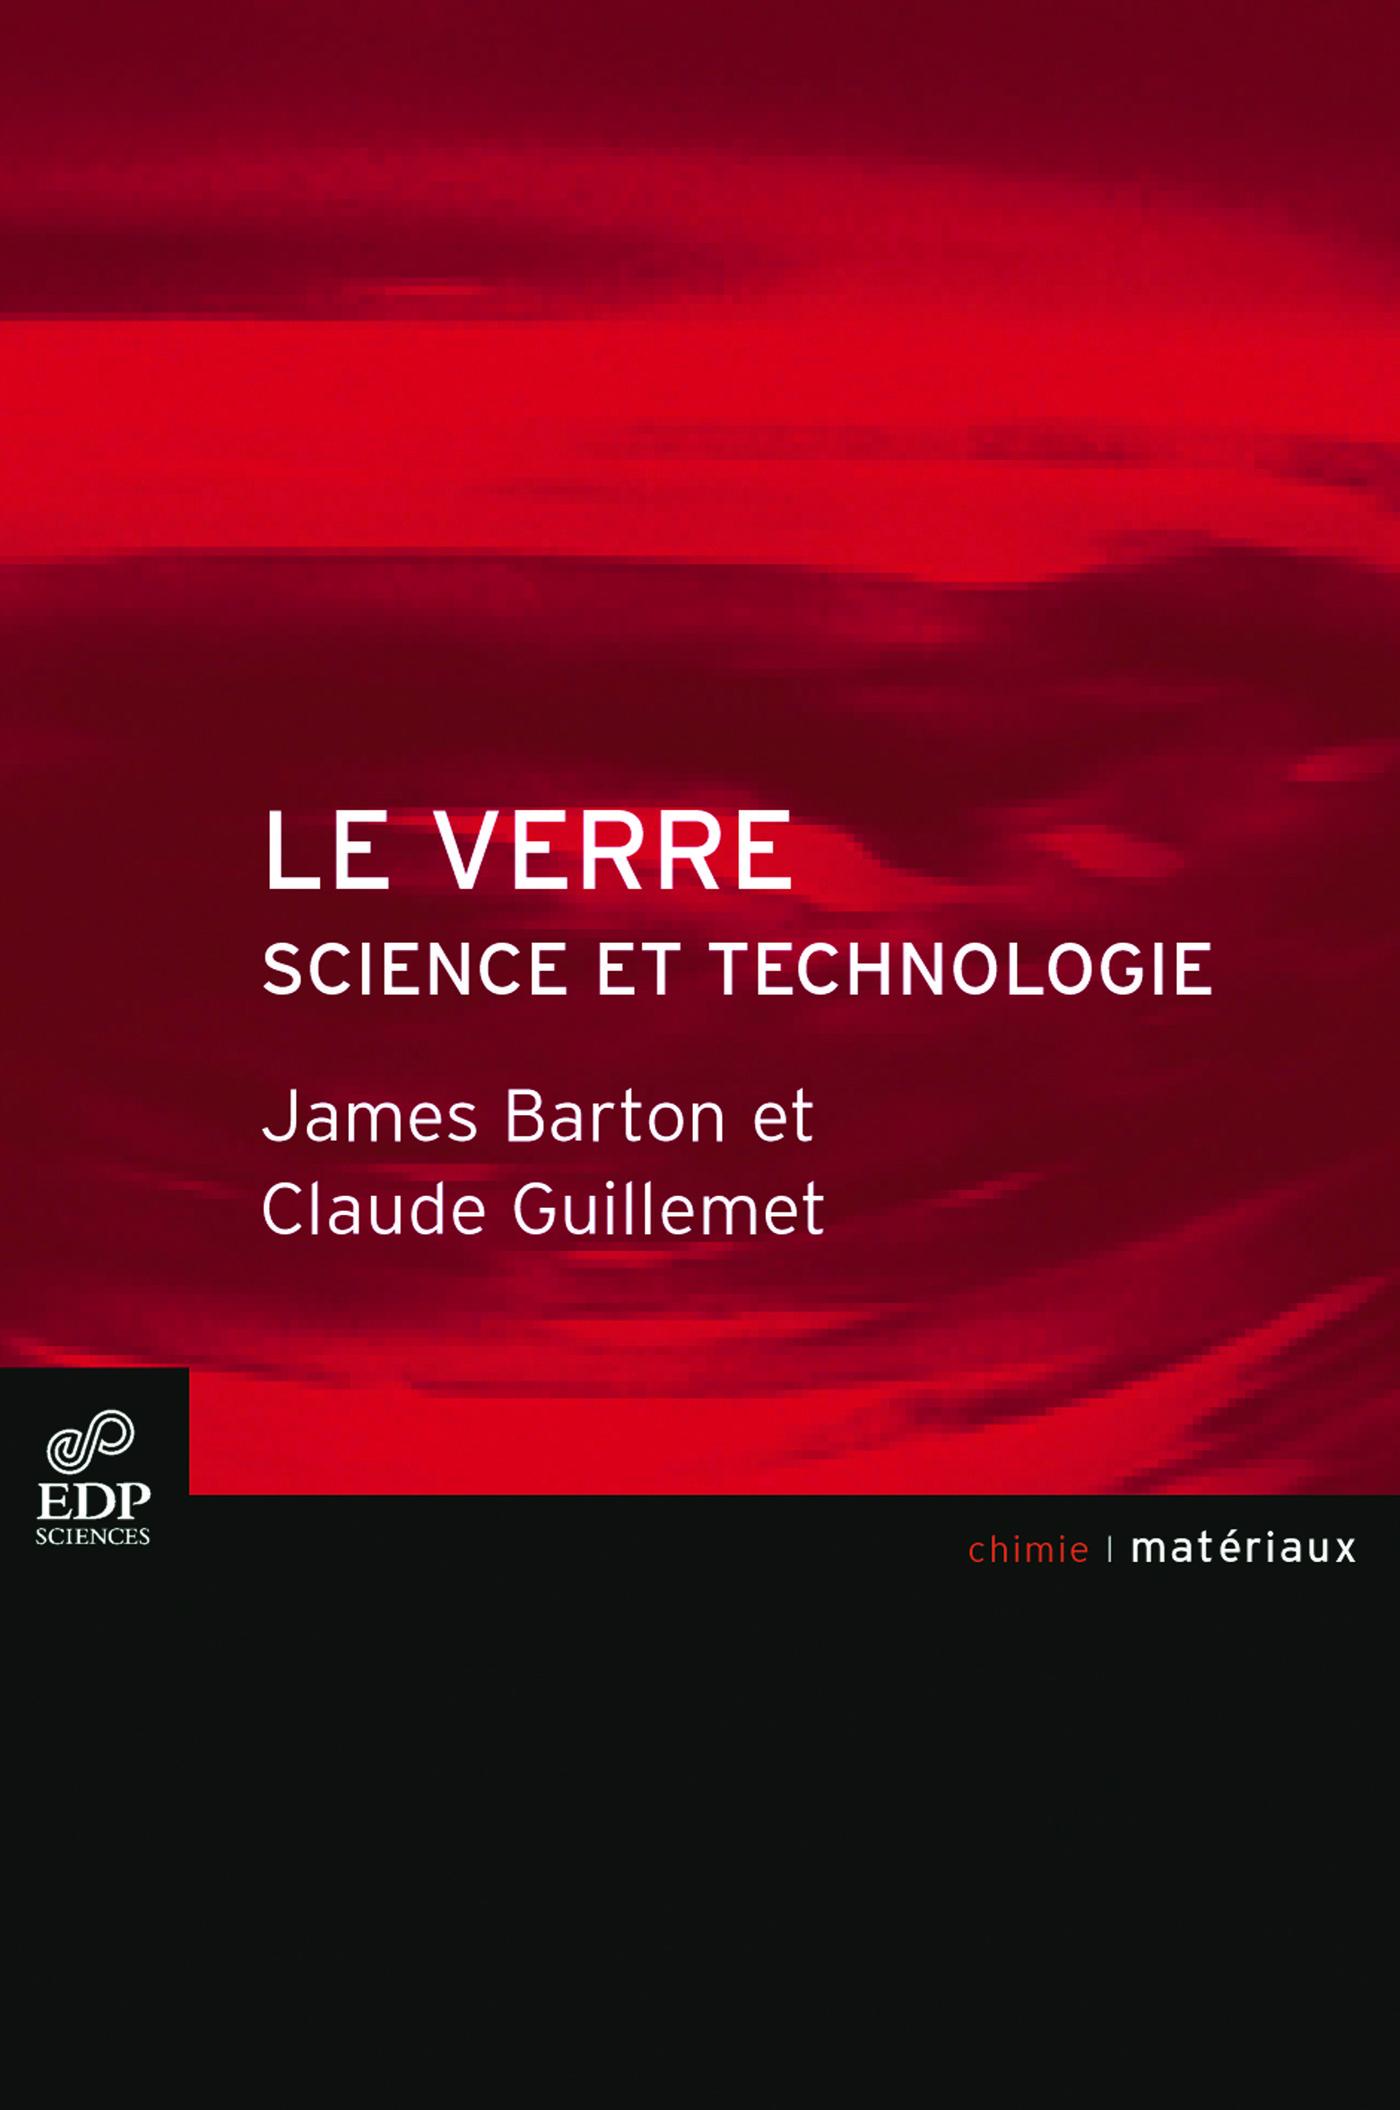 VERRE, SCIENCE ET TECHNOLOGIE